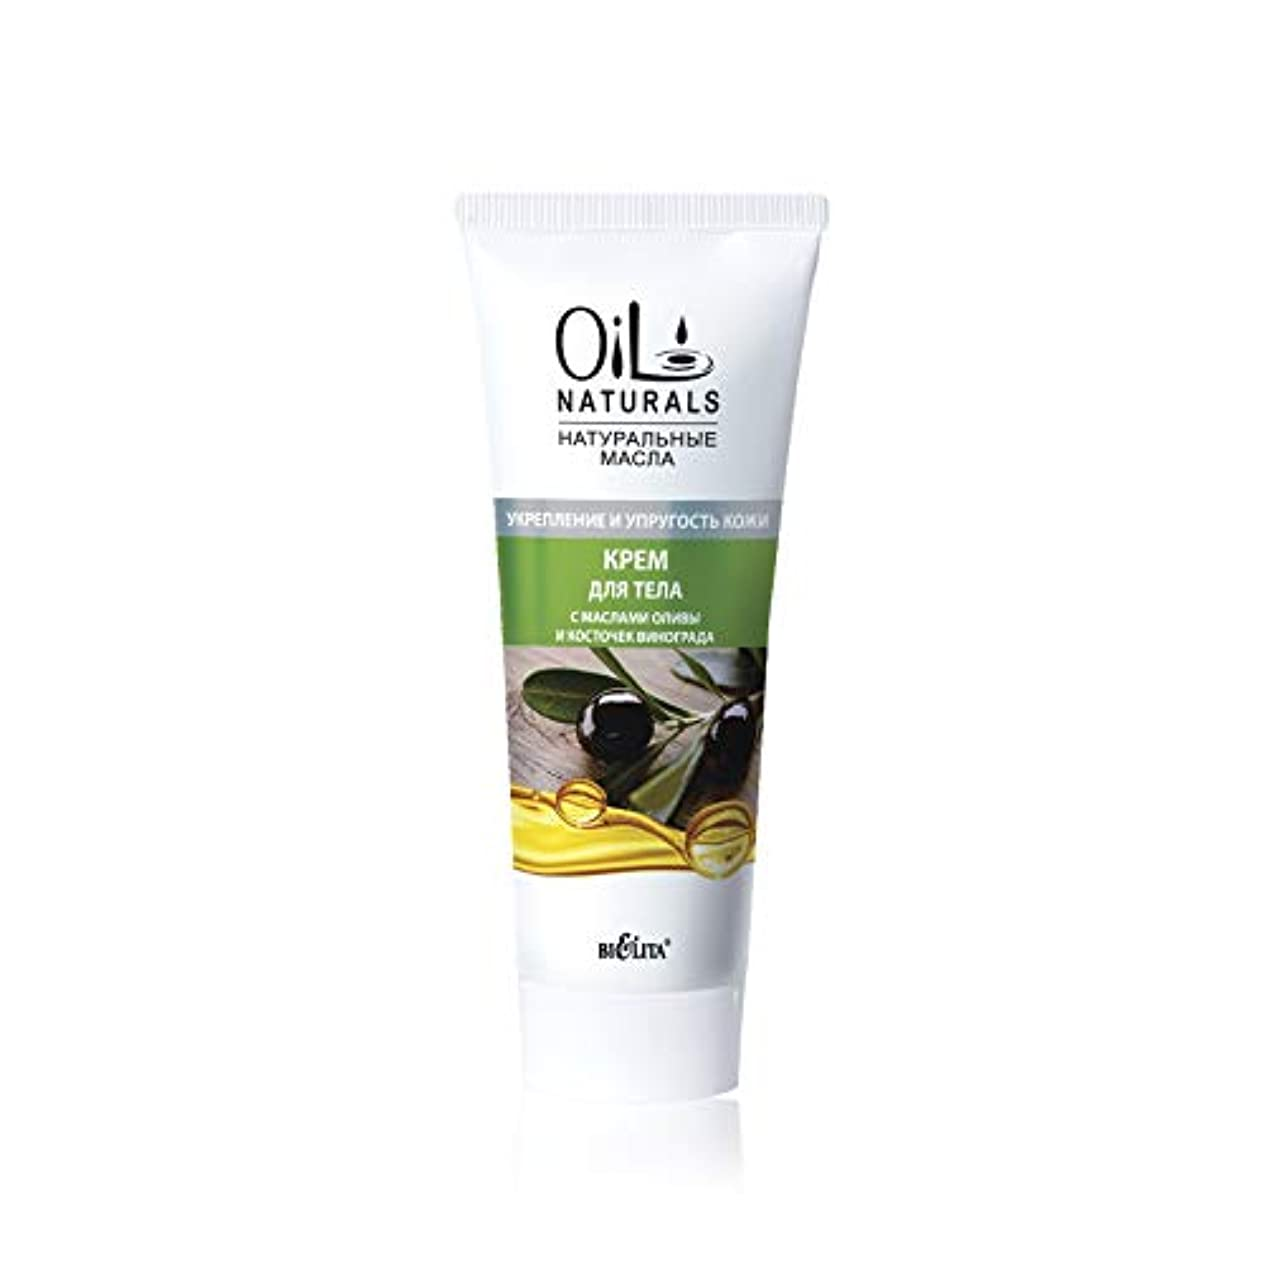 適応的簿記係常にBielita & Vitex | Oil Naturals Line | Skin Firming & Moisturizing Body Cream, 200 ml | Olive Oil, Silk Proteins...